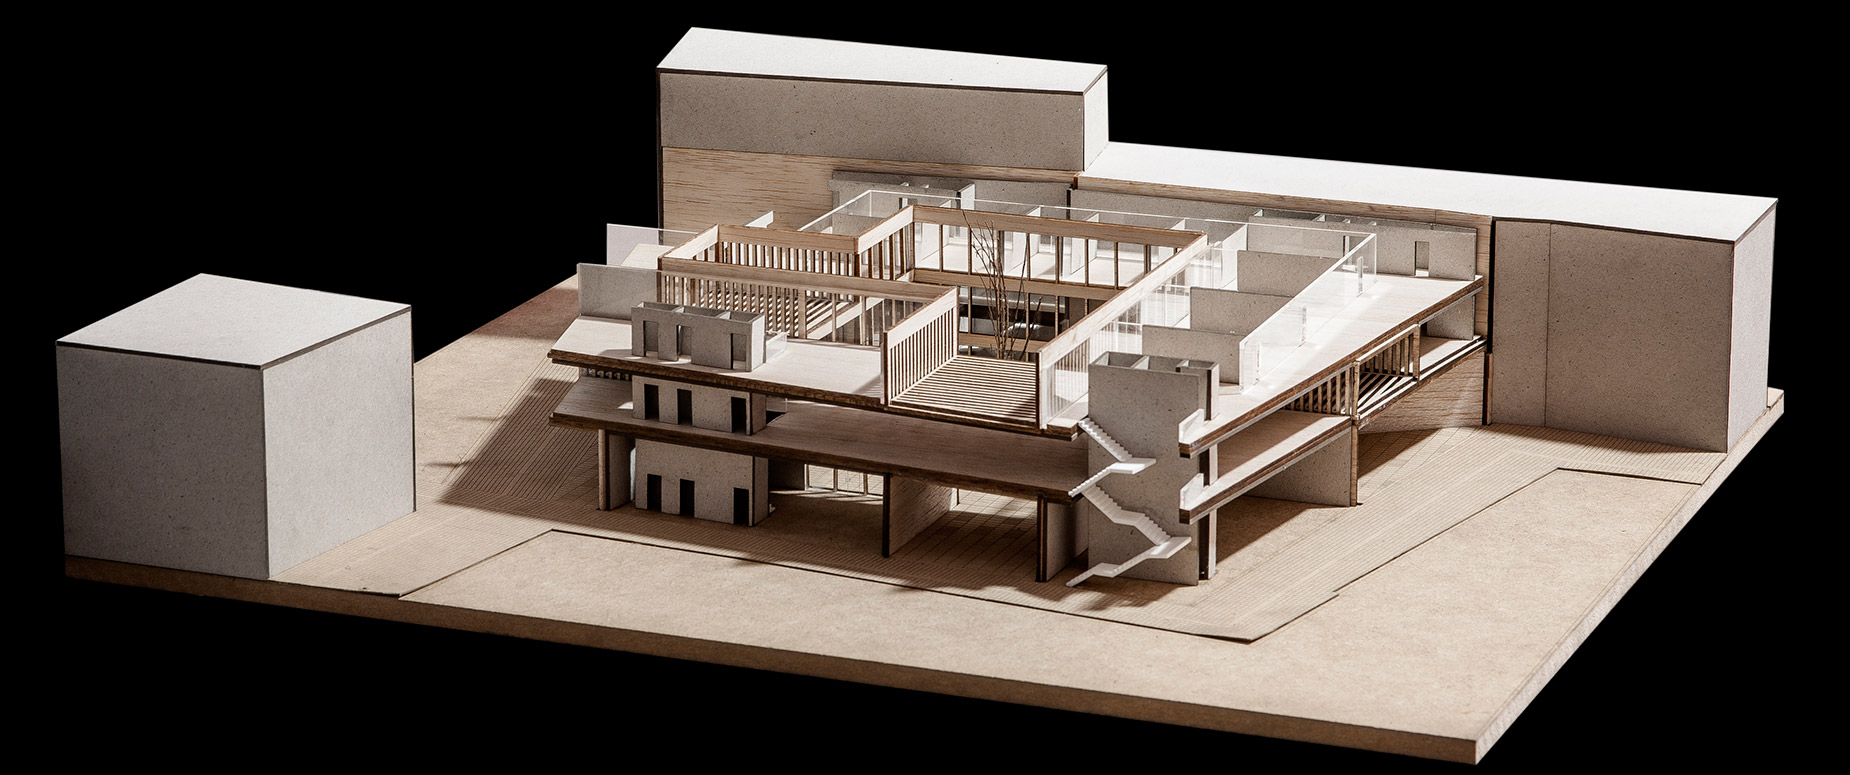 maqueta-arquitectura-architecture model-valencia-maqueta pfc-ETSAV-Biblioteca-arquimaqueta (4)